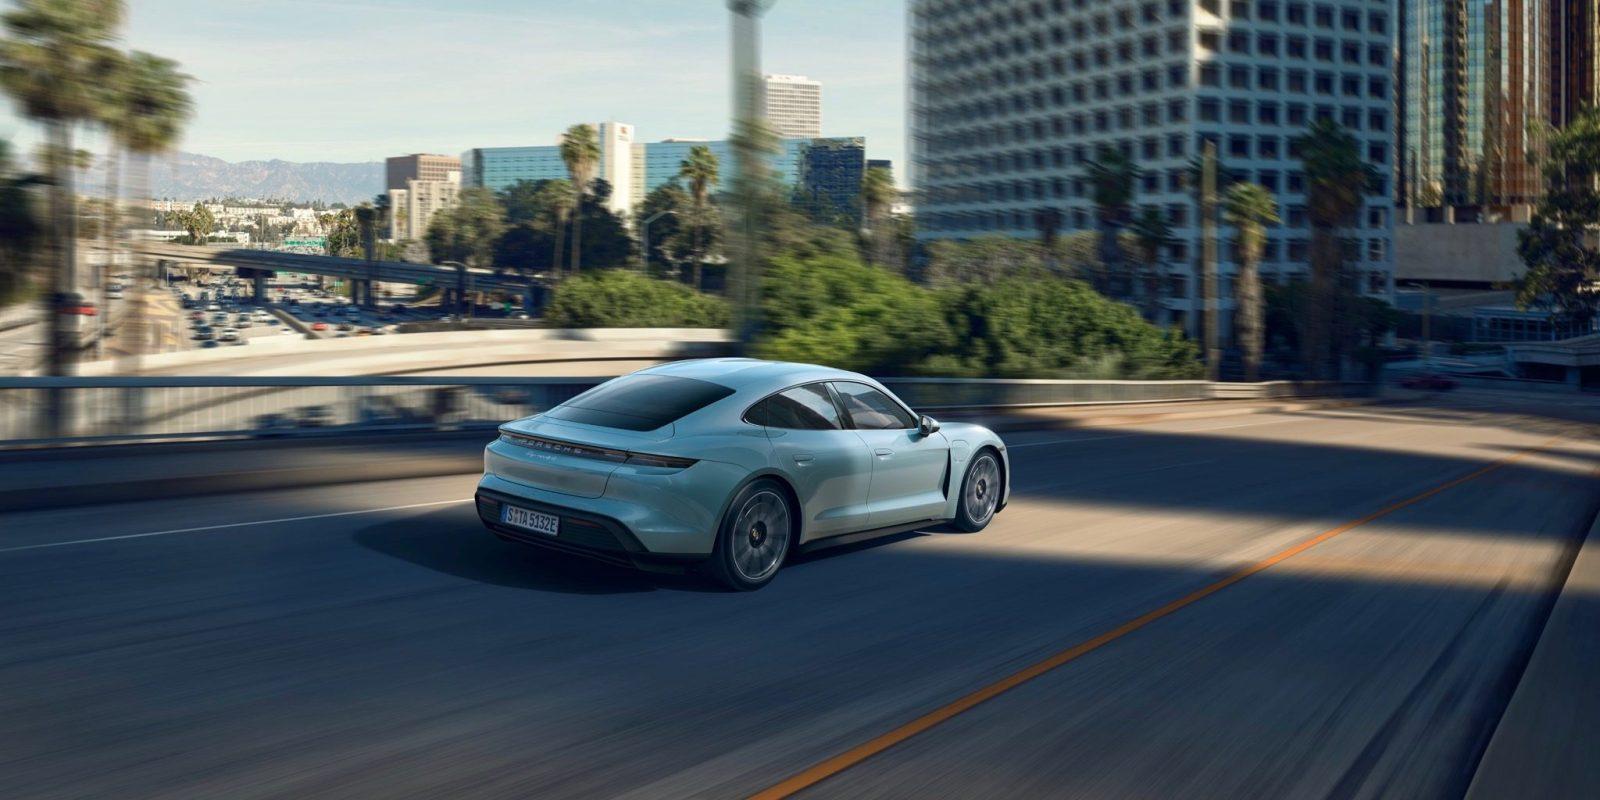 Porsche Taycan Turbo S is new least-efficient EV: 68 MPGe, 192 miles EPA range